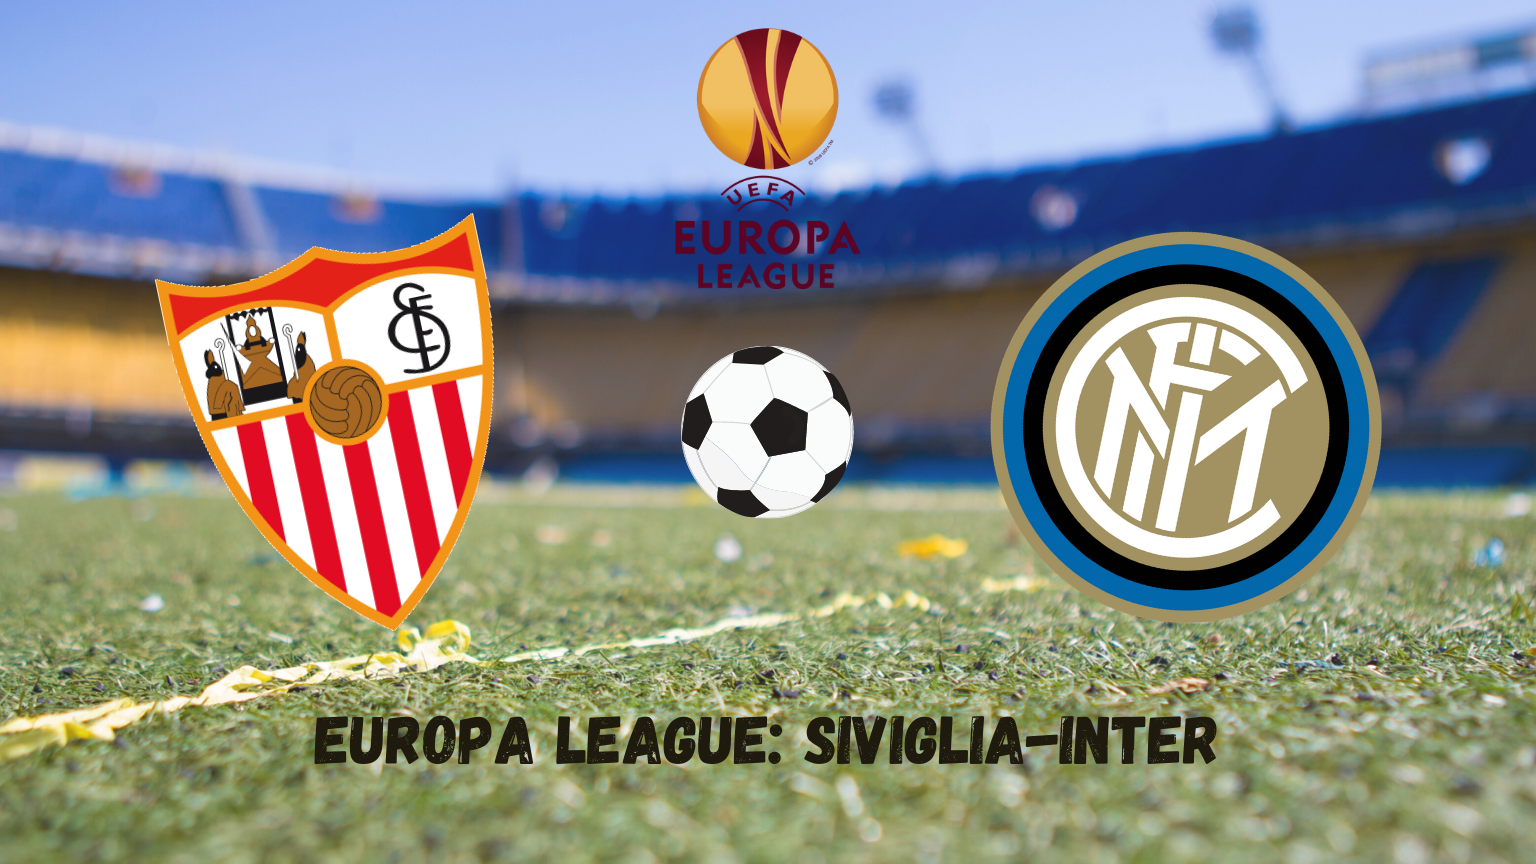 Pronostici Europa League: Siviglia-Inter